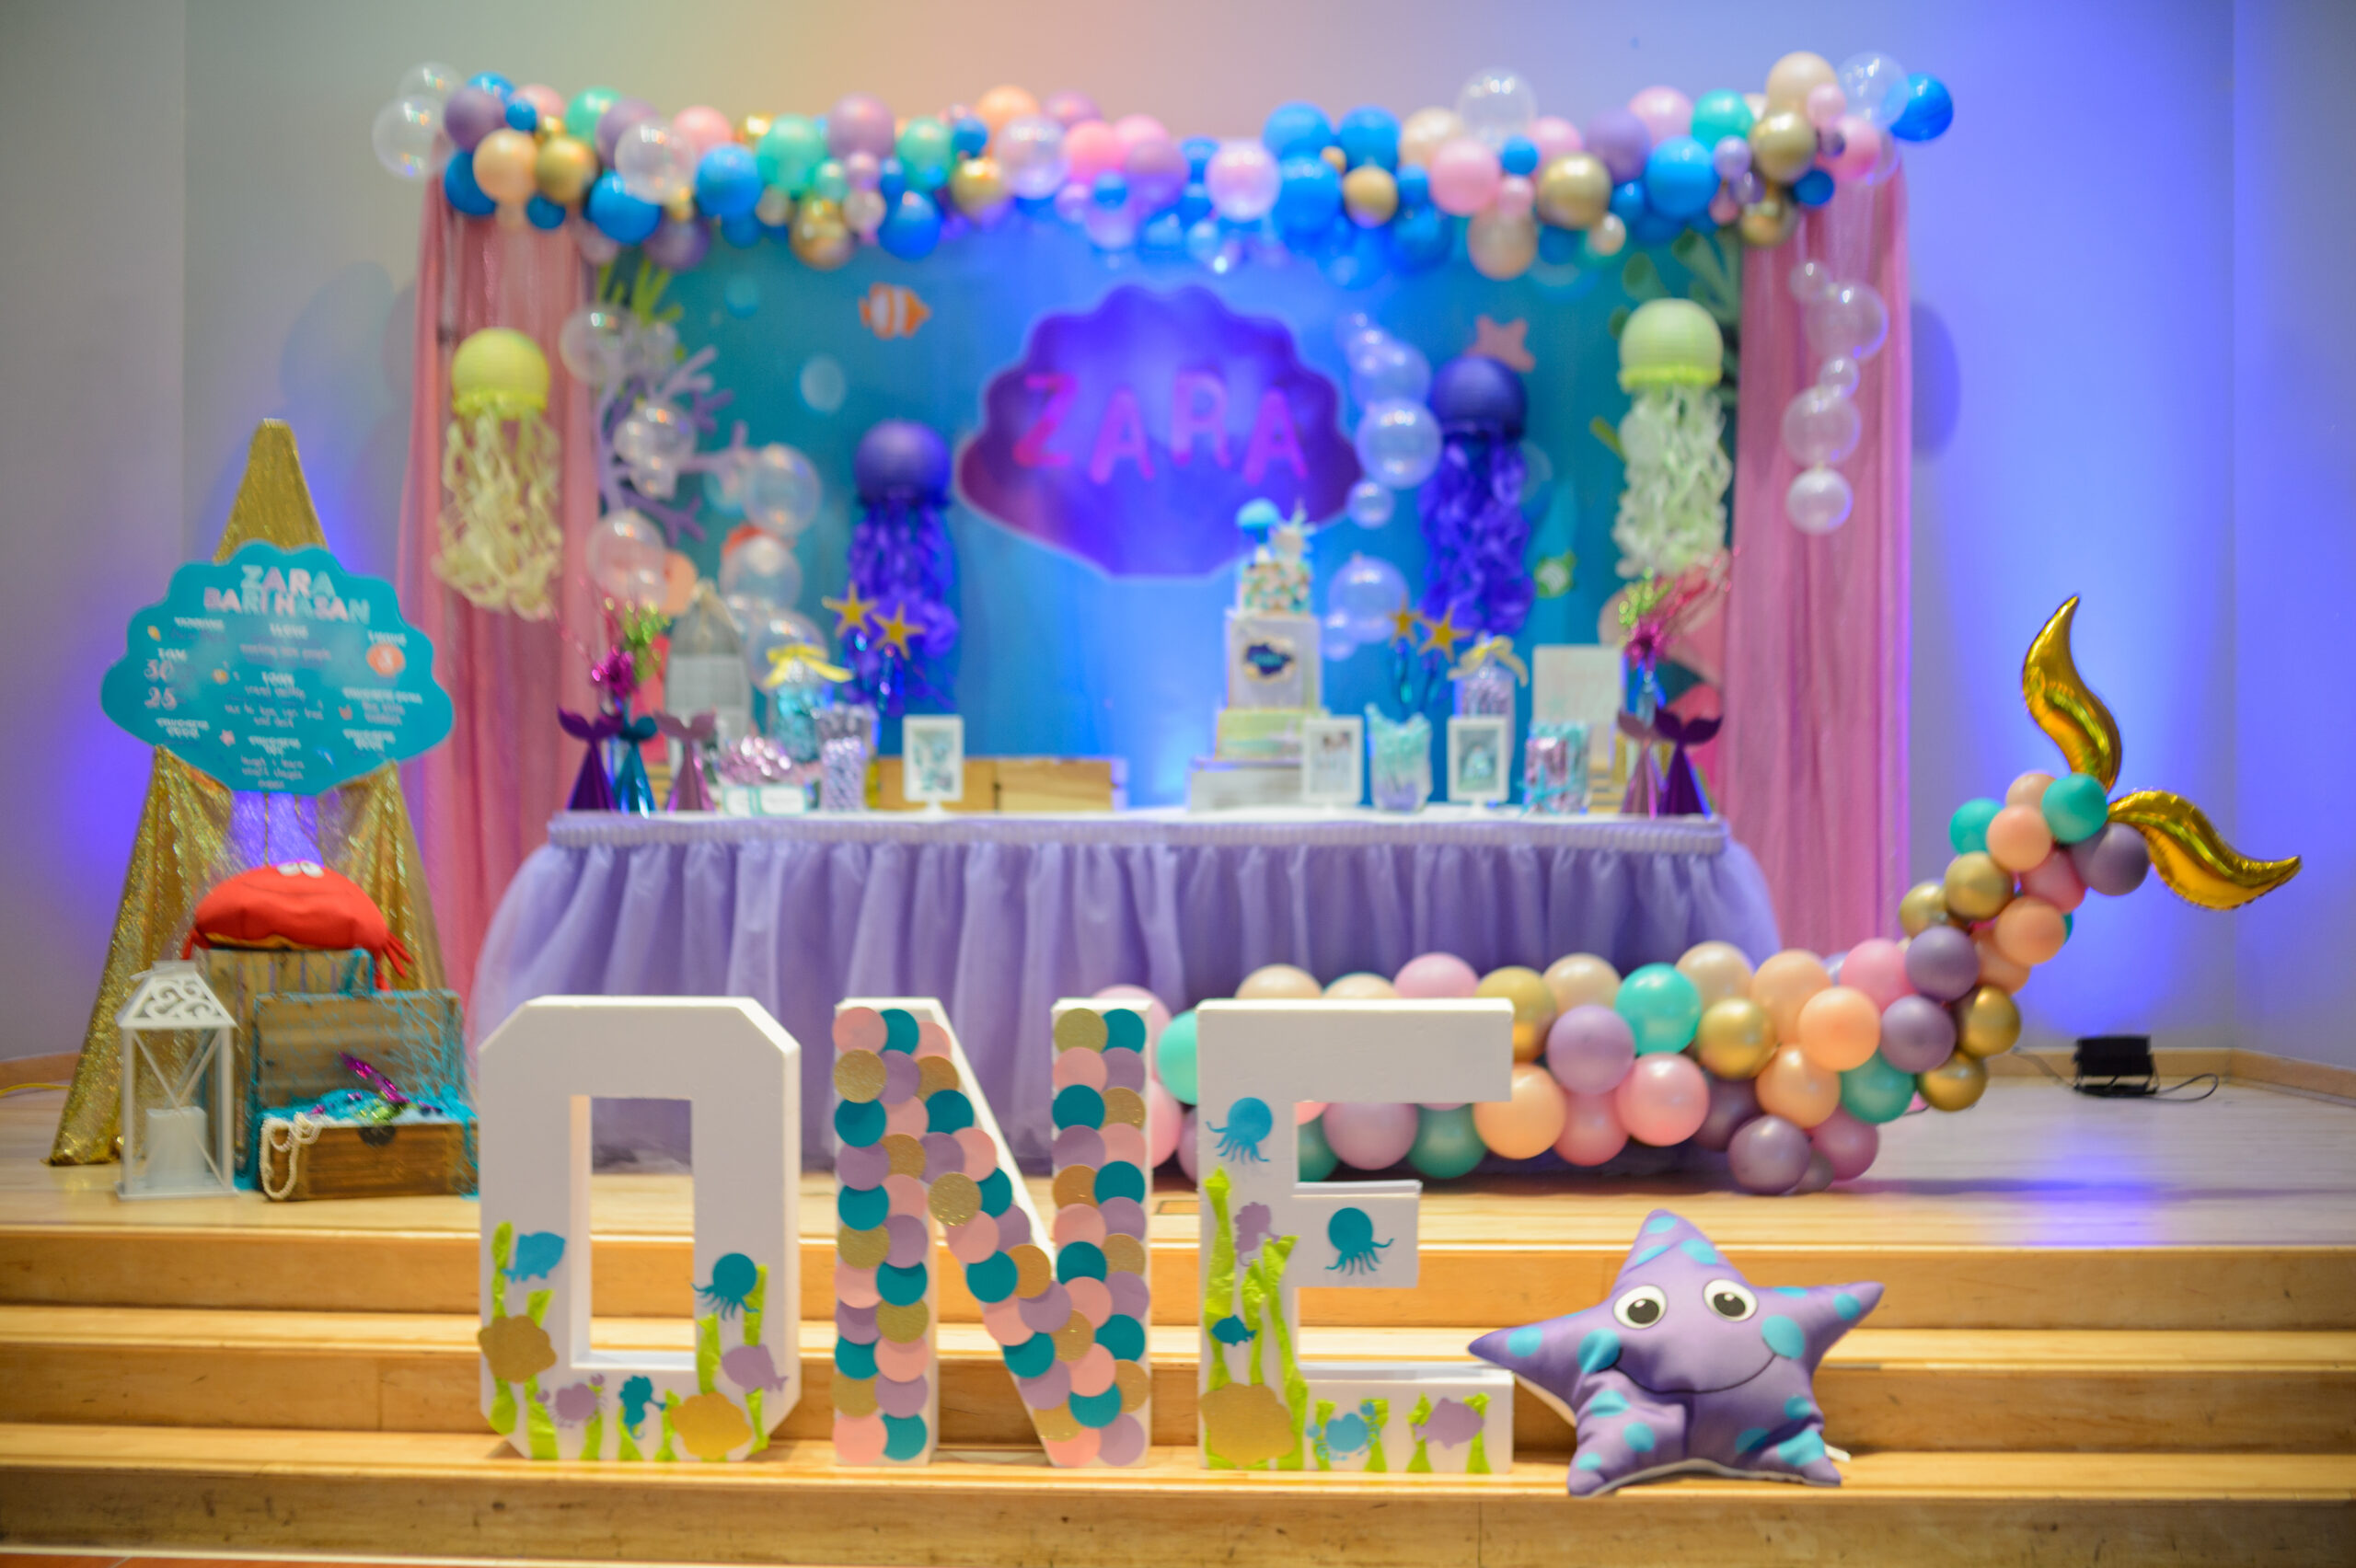 Sarsie's Parties 08-03-19 Under the Sea Birthday Party (Girl)